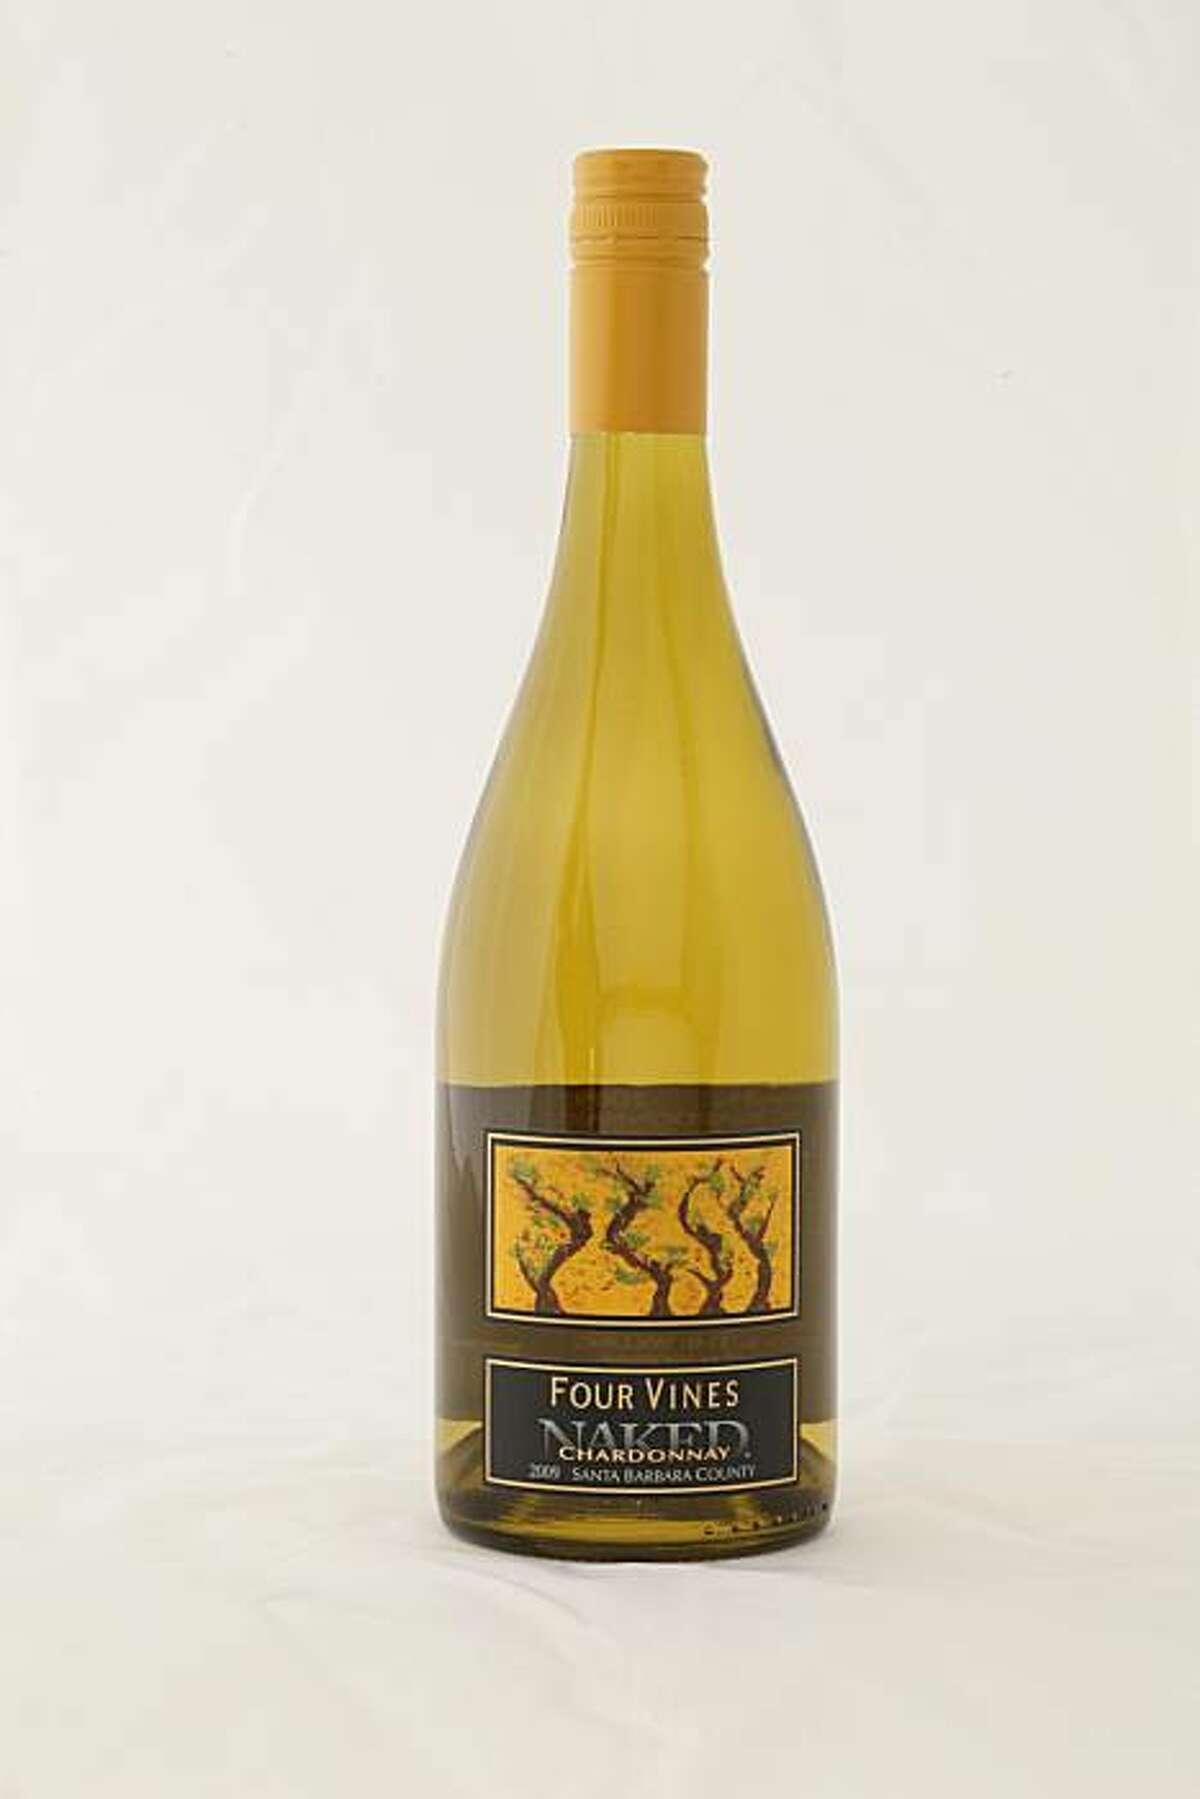 2009 Four Vines Naked Chardonnay Santa Barbara County as seen in San Francisco, California, on January 26, 2010.